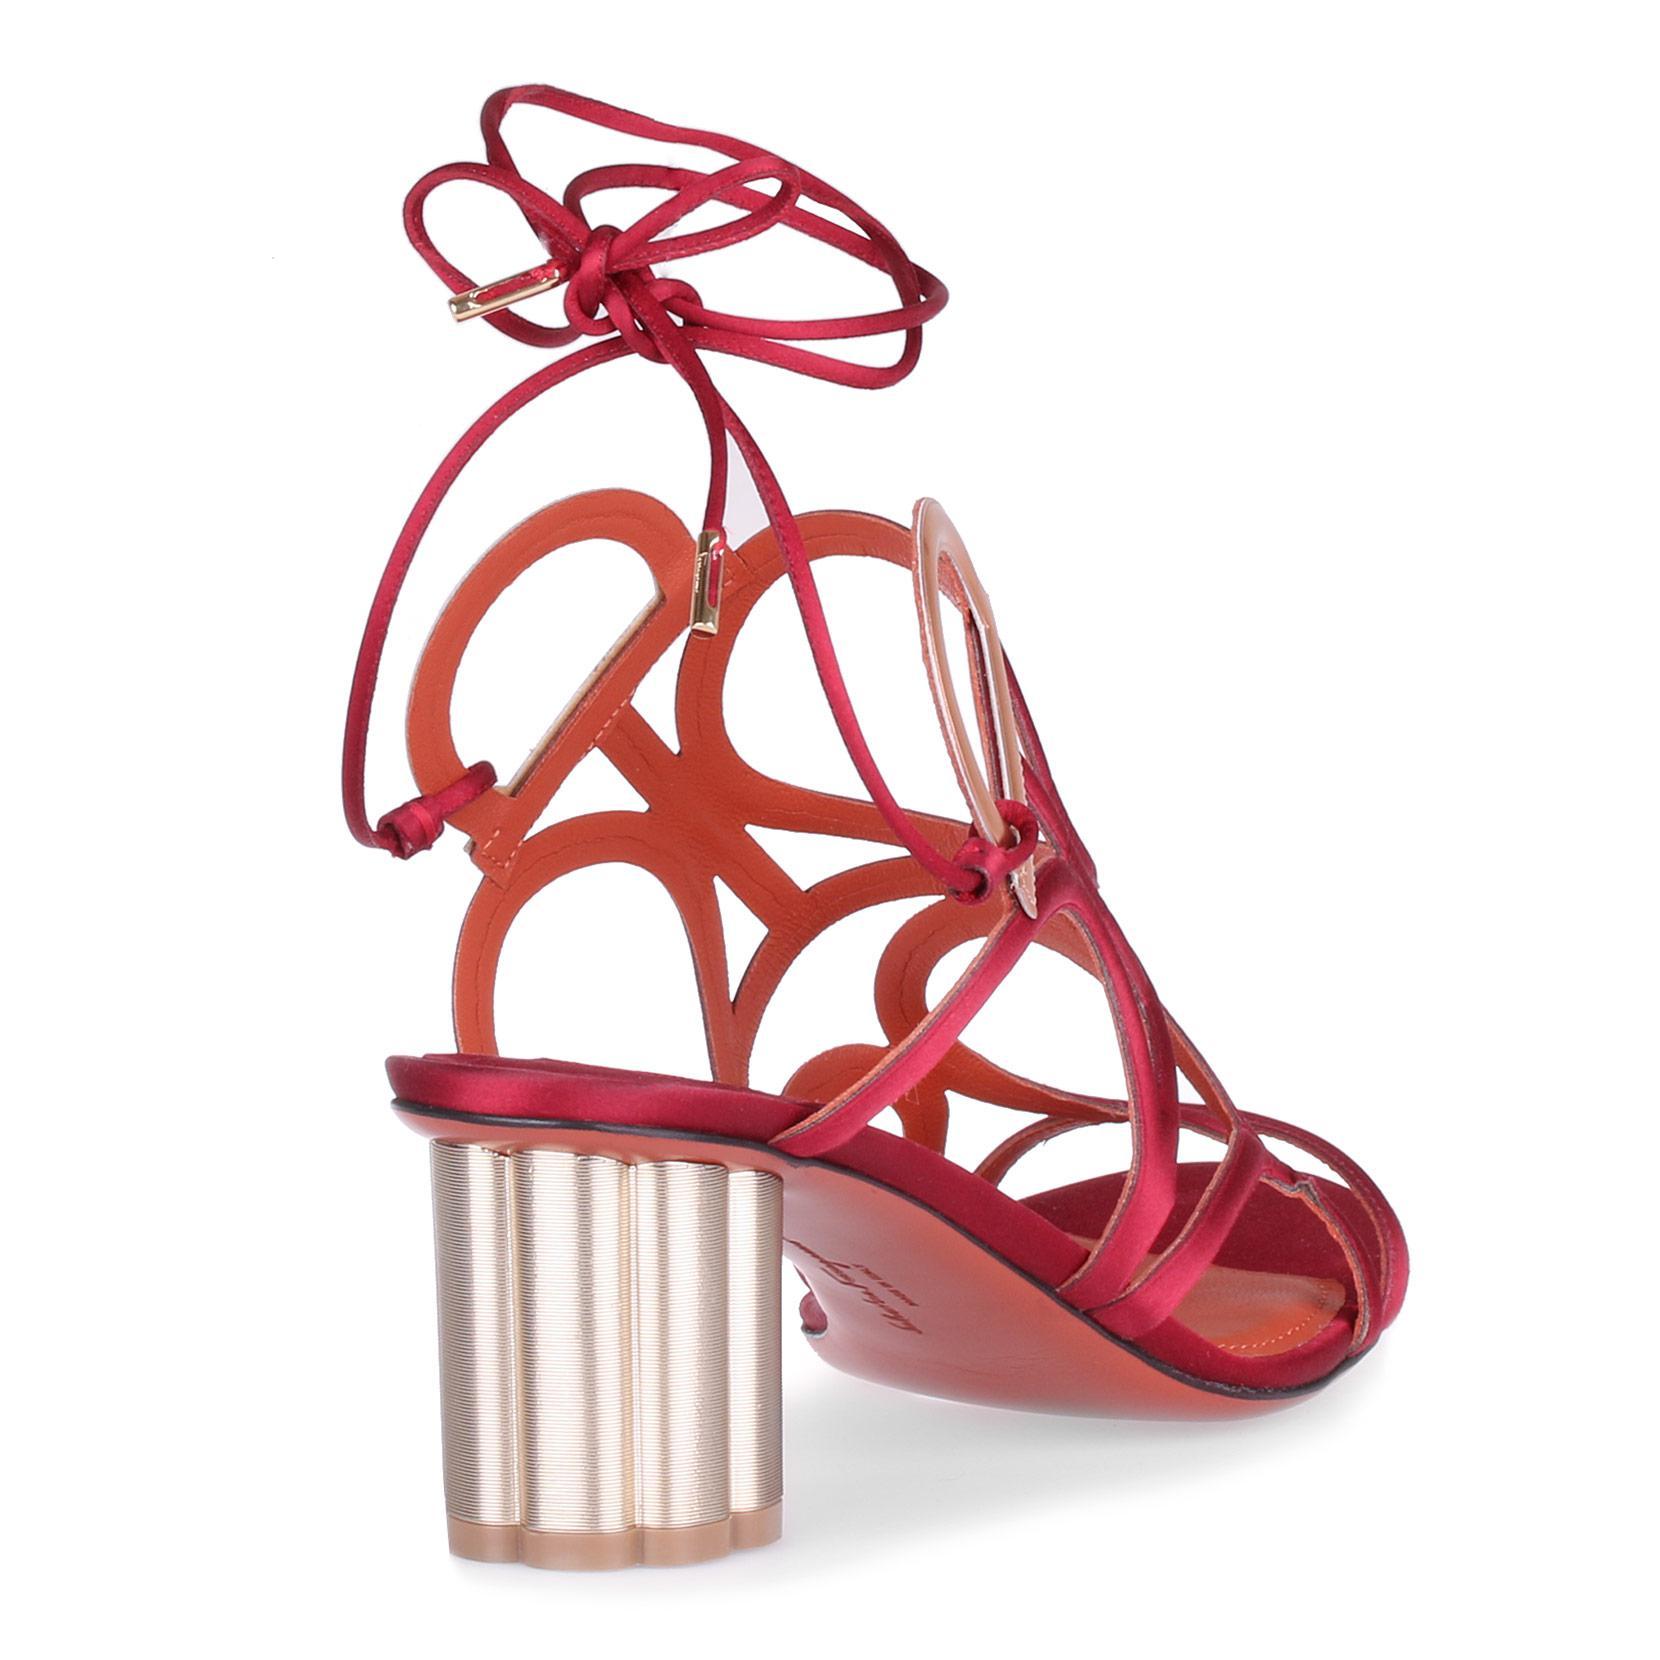 Vinci 55 crepe satin sunstone sandal Salvatore Ferragamo 71FKkZaICo